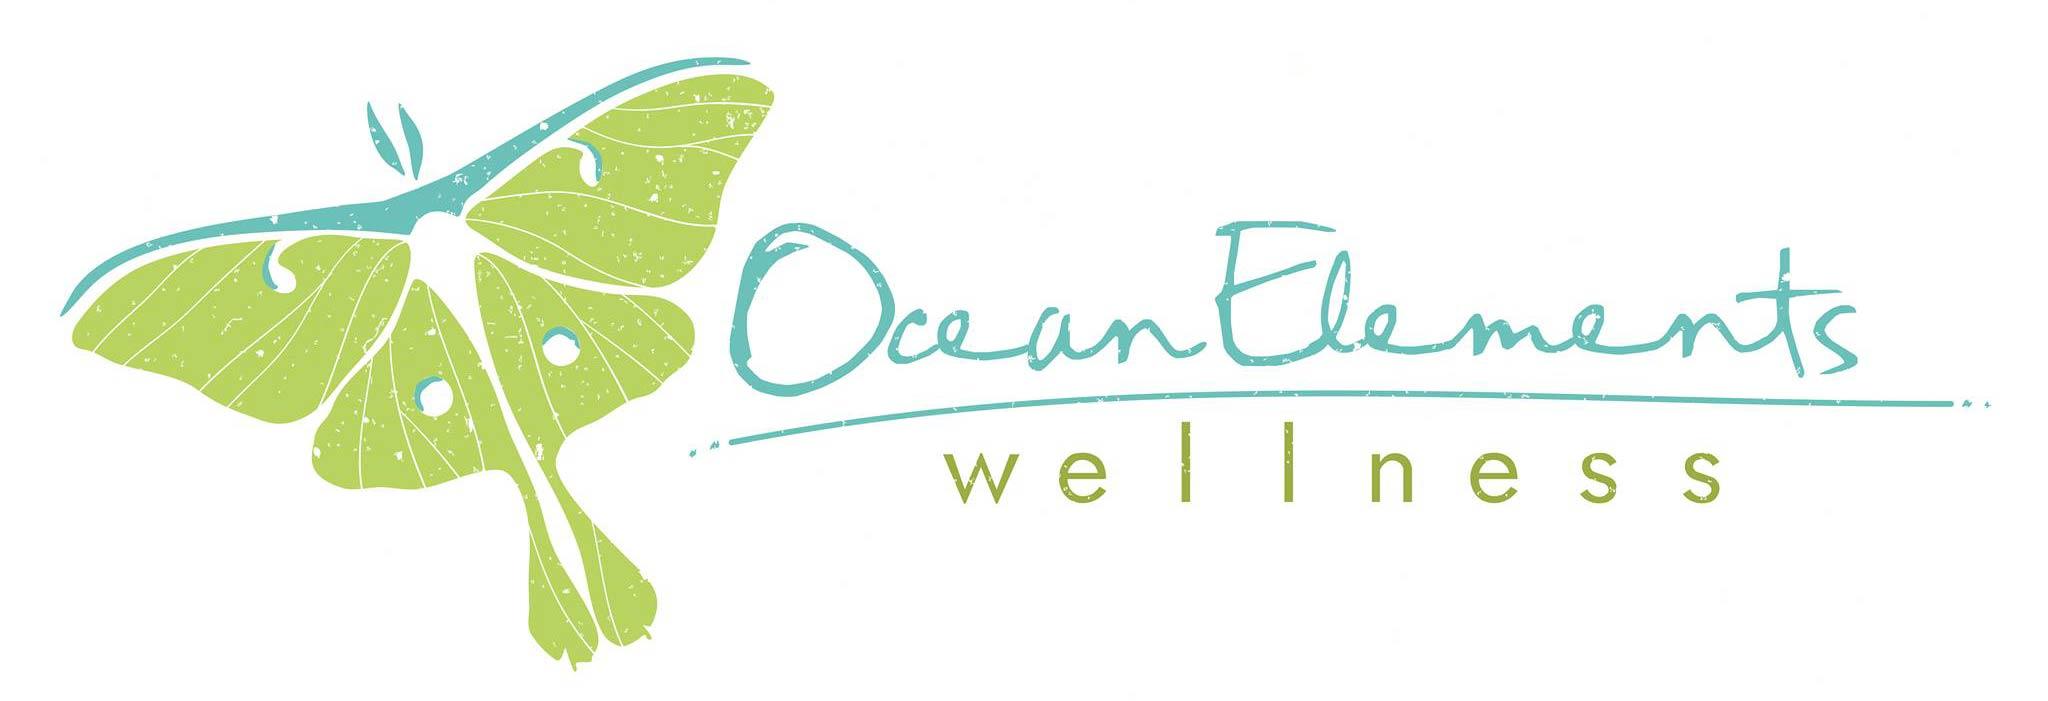 Ocean Elements Wellness